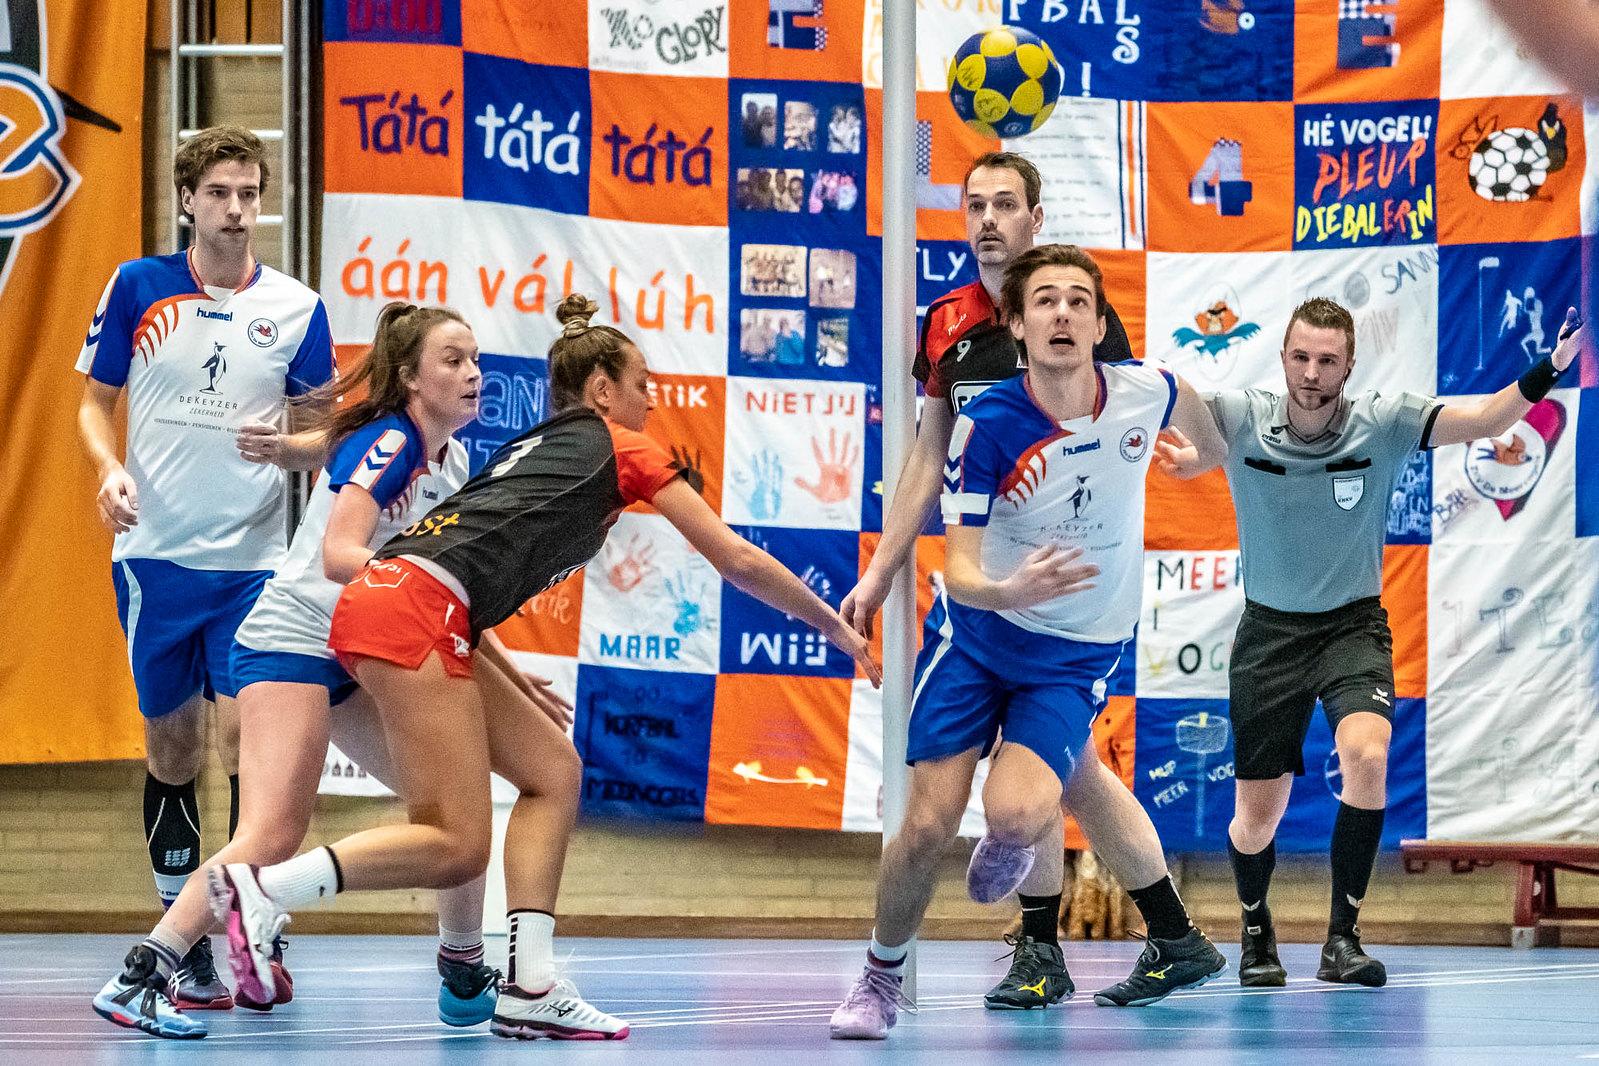 Korfbal: 2019-01-19 Meervogels / Física 1 – TOP 1 [28 – 32]